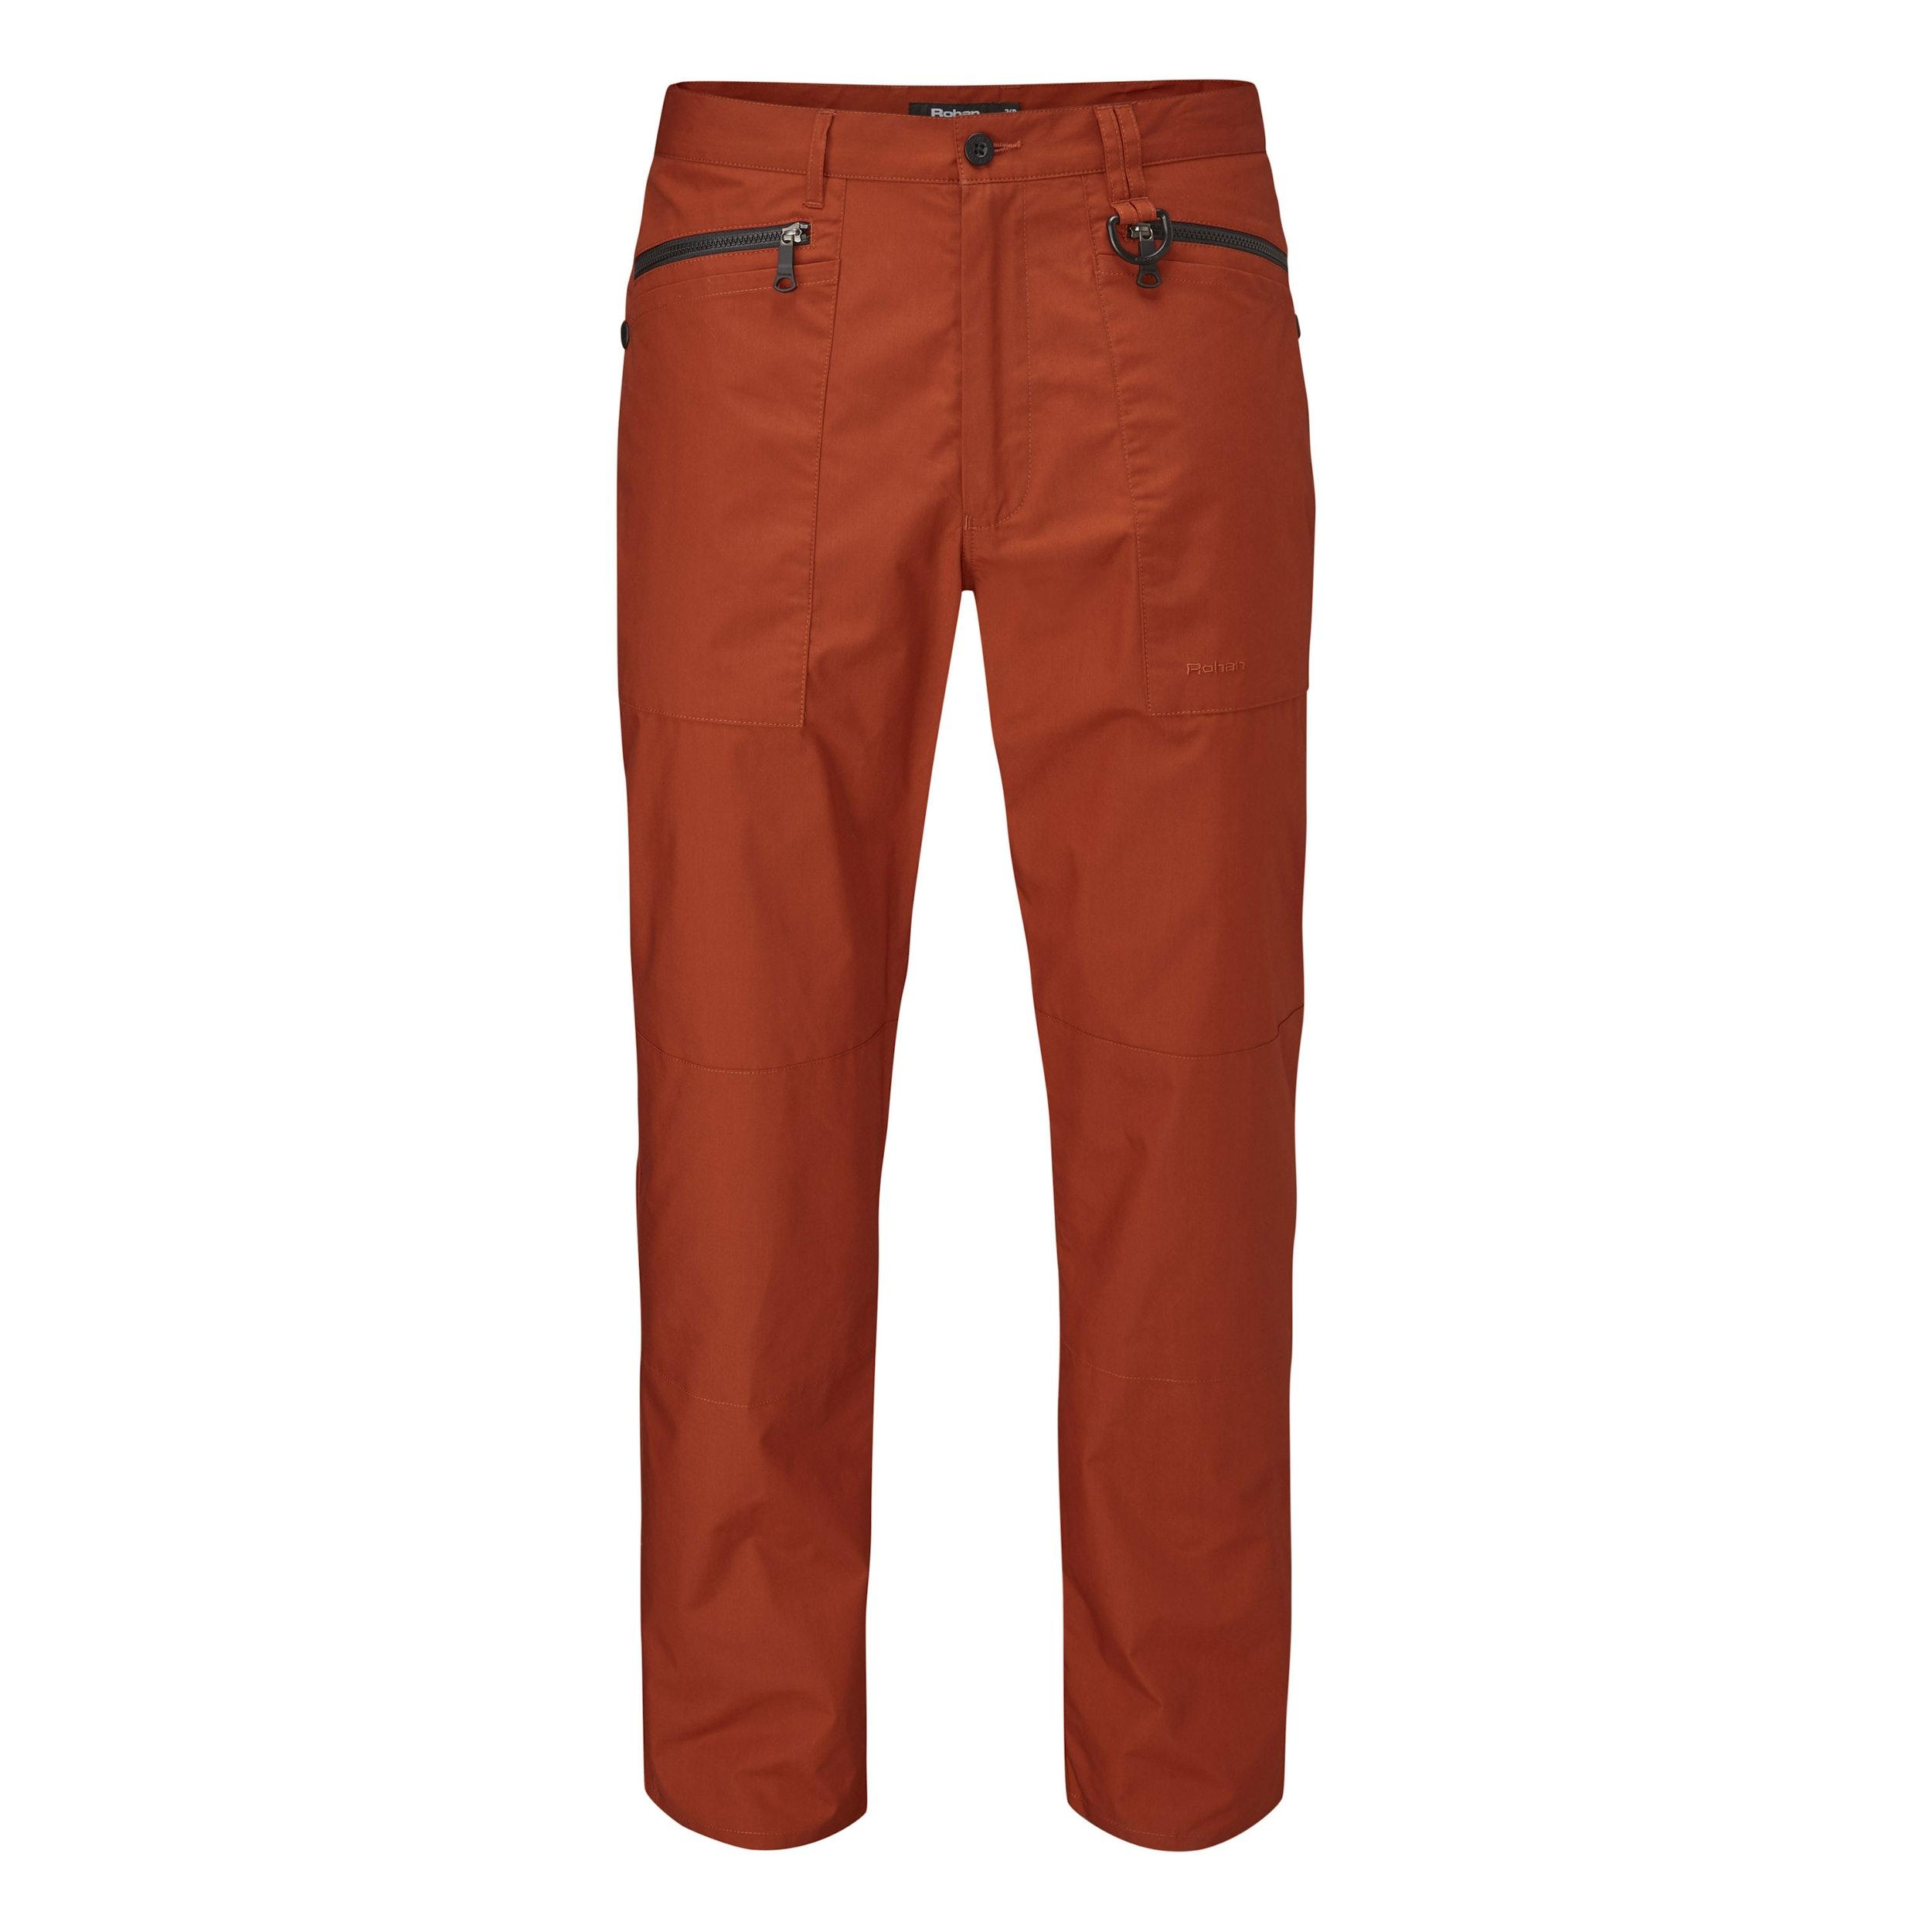 a48a9fdc159e0 Men's Bags - The original travel trousers.